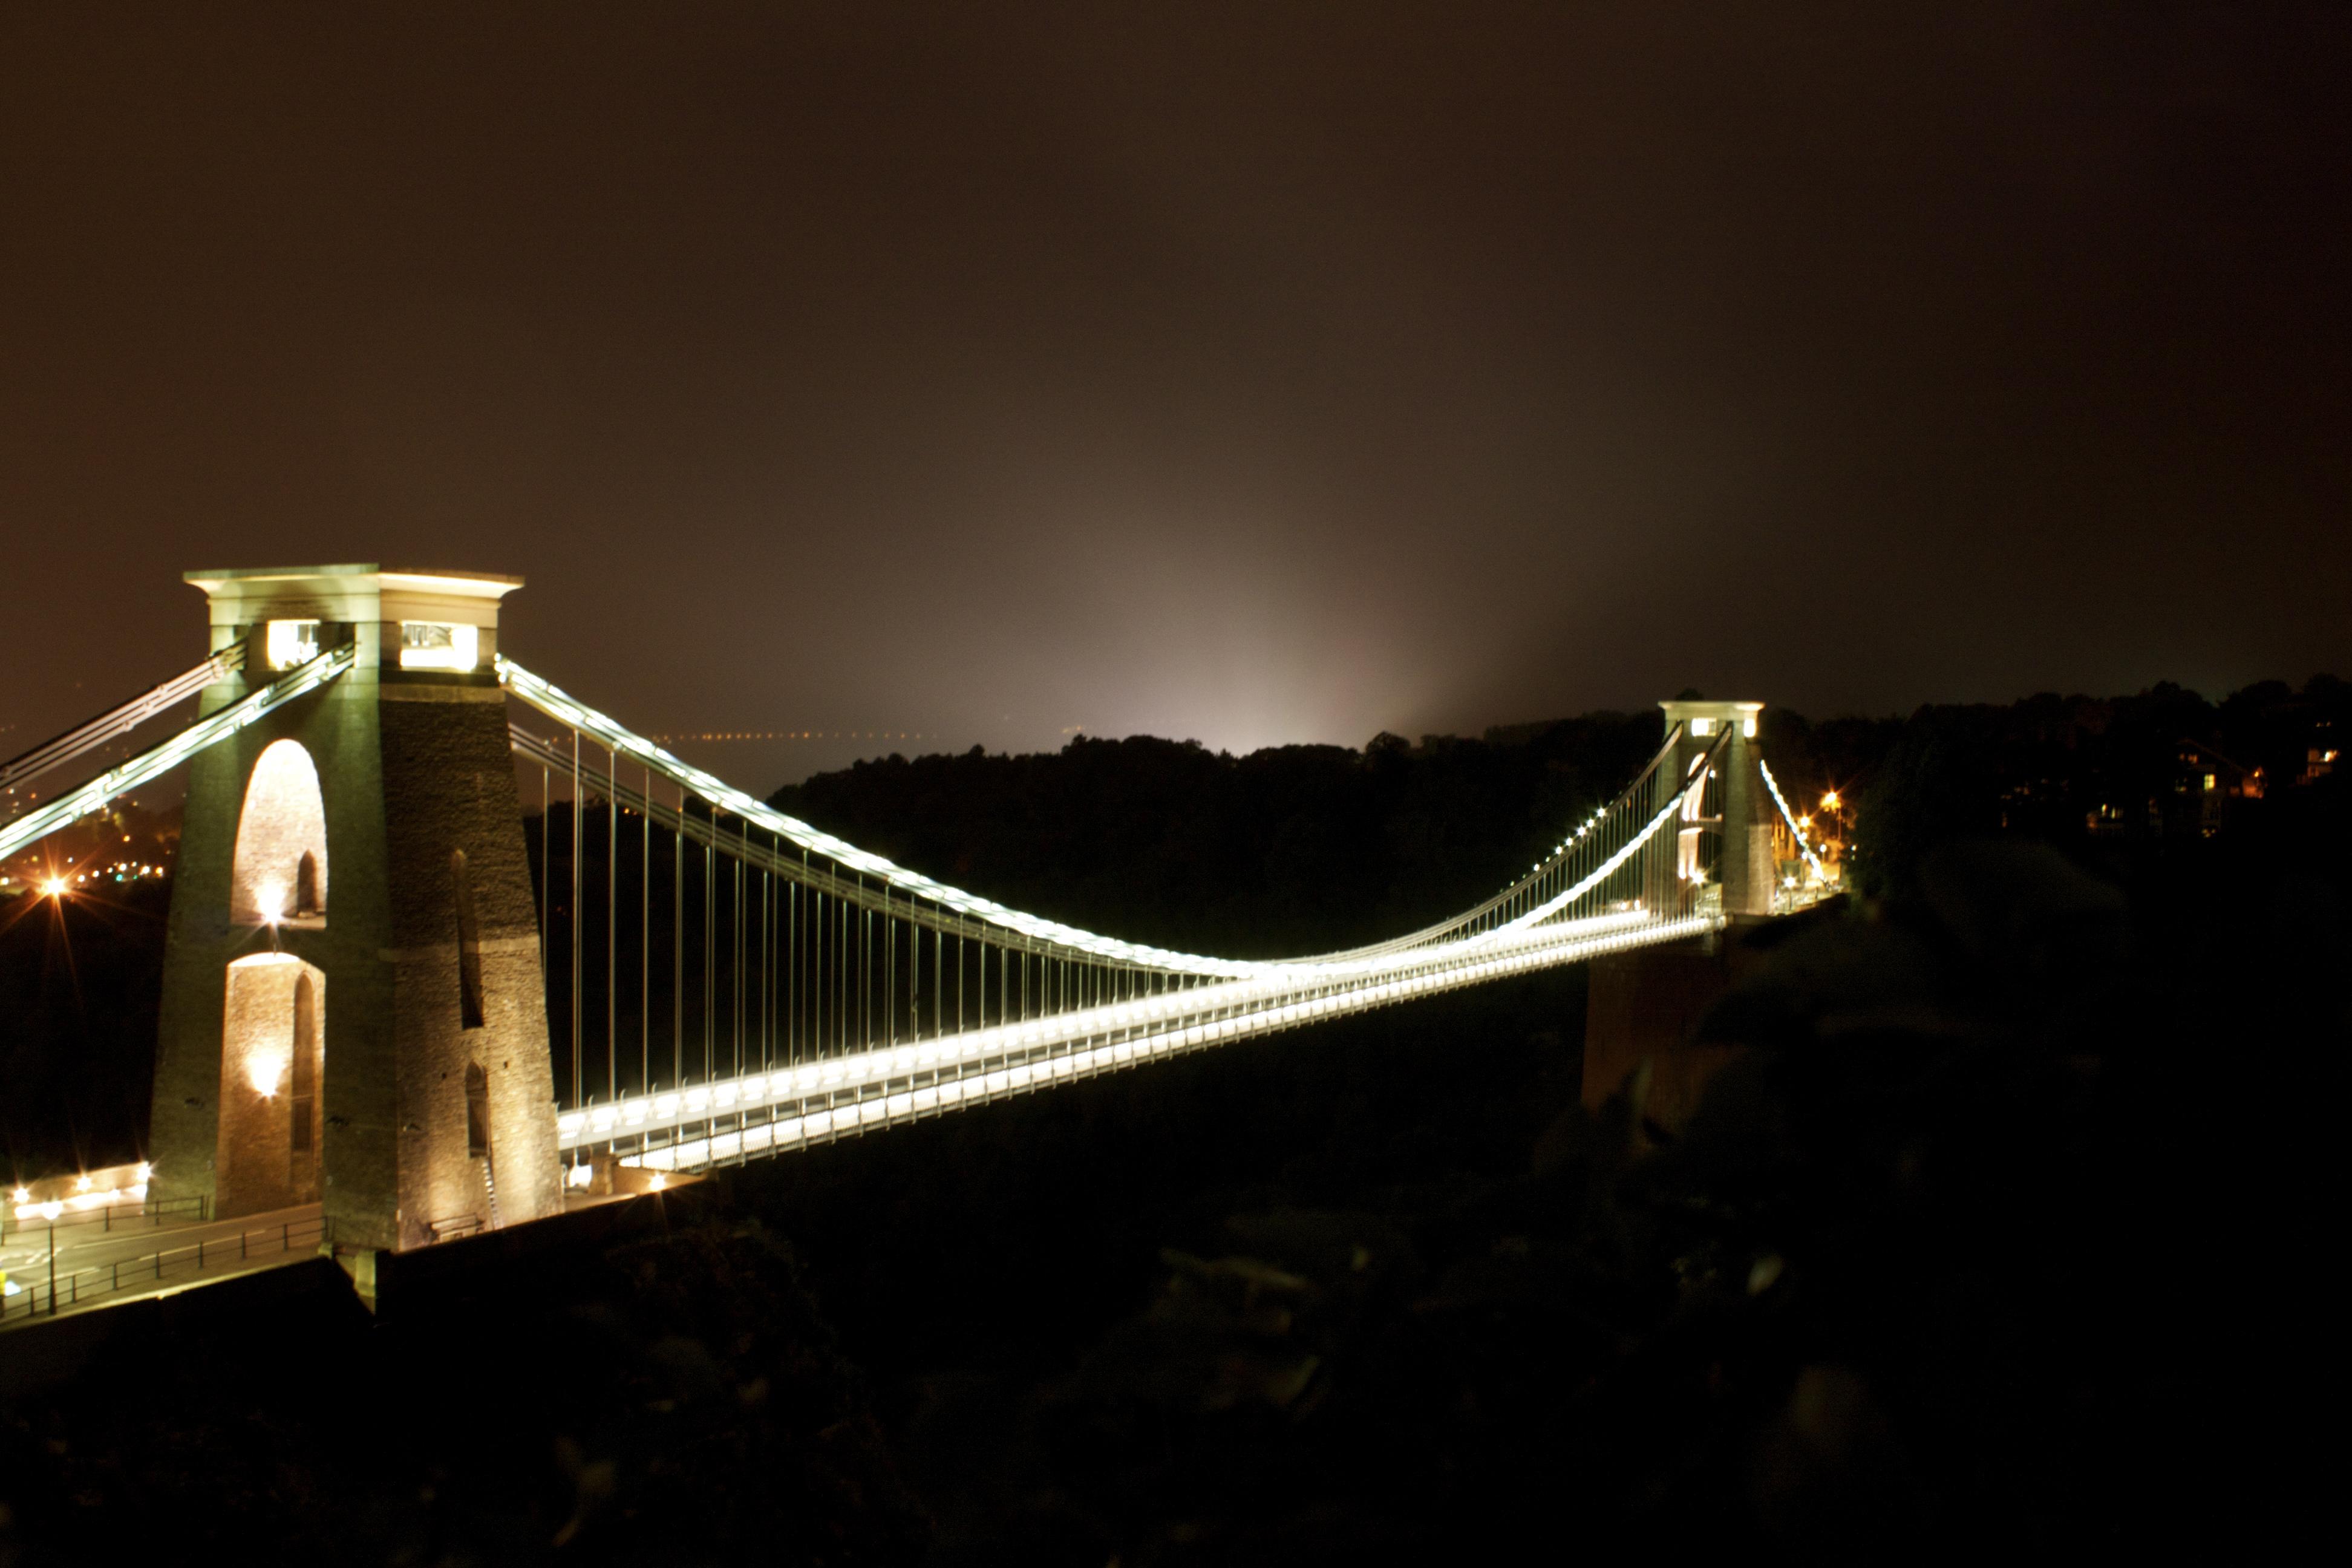 Suspension Bridge, Wheeling: Address, Suspension Bridge Reviews: 5/5